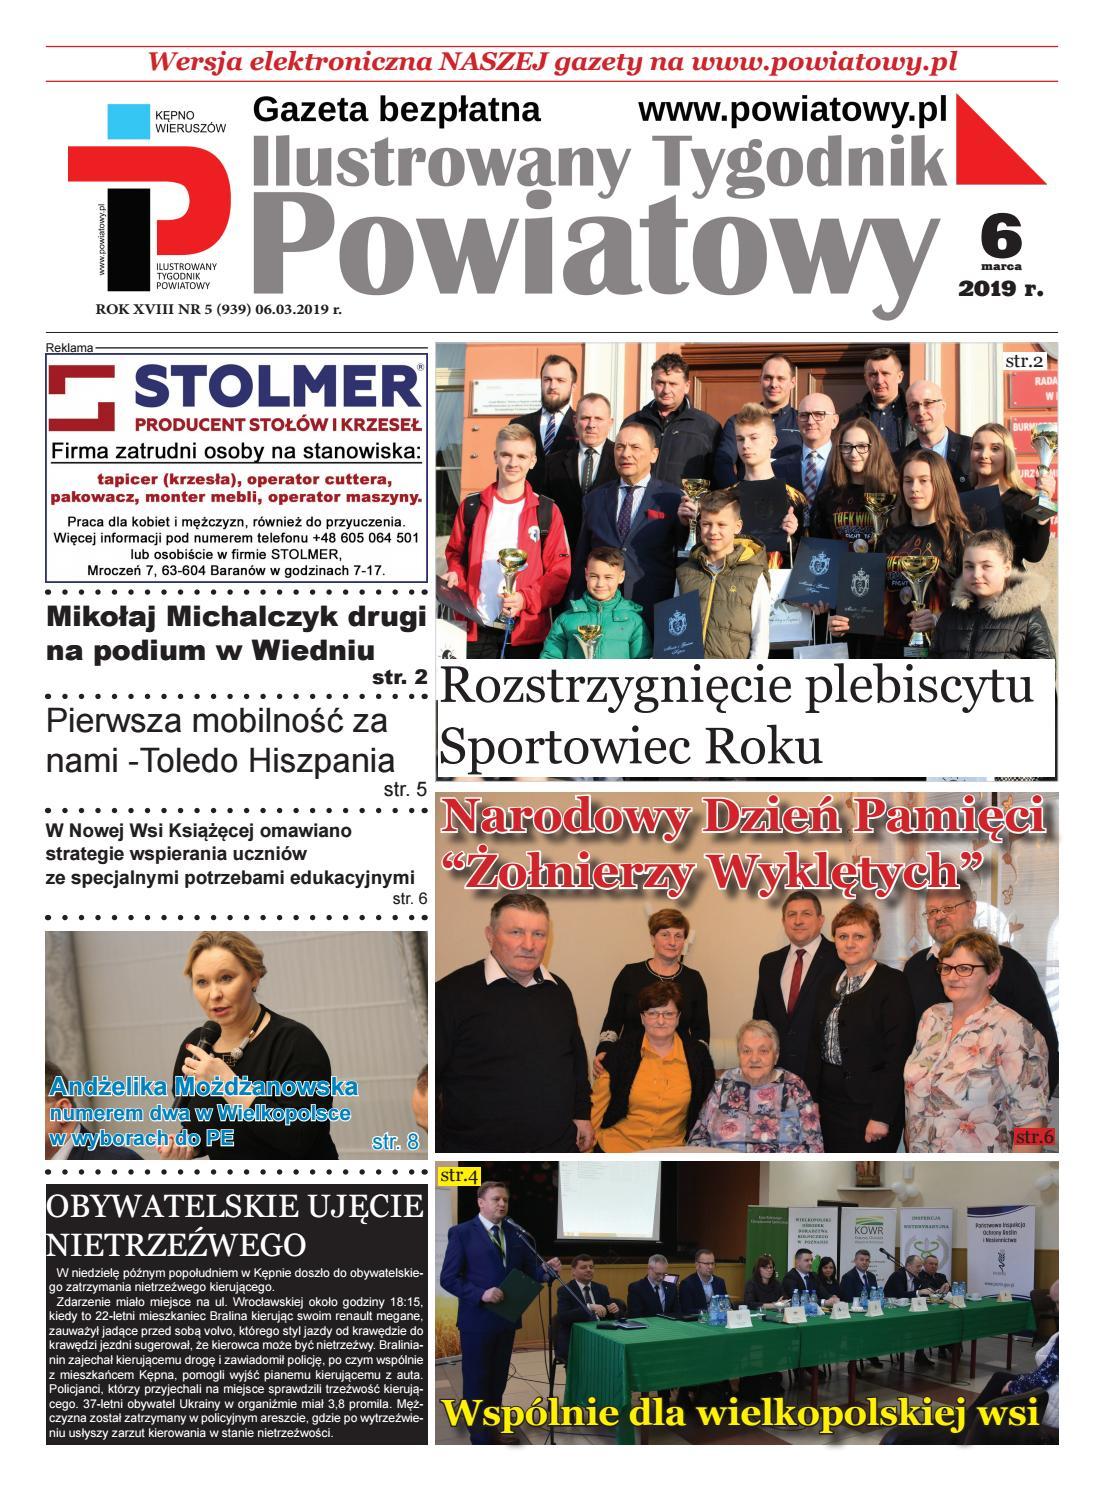 Asset Publisher - Nadlenictwo Lidzbark